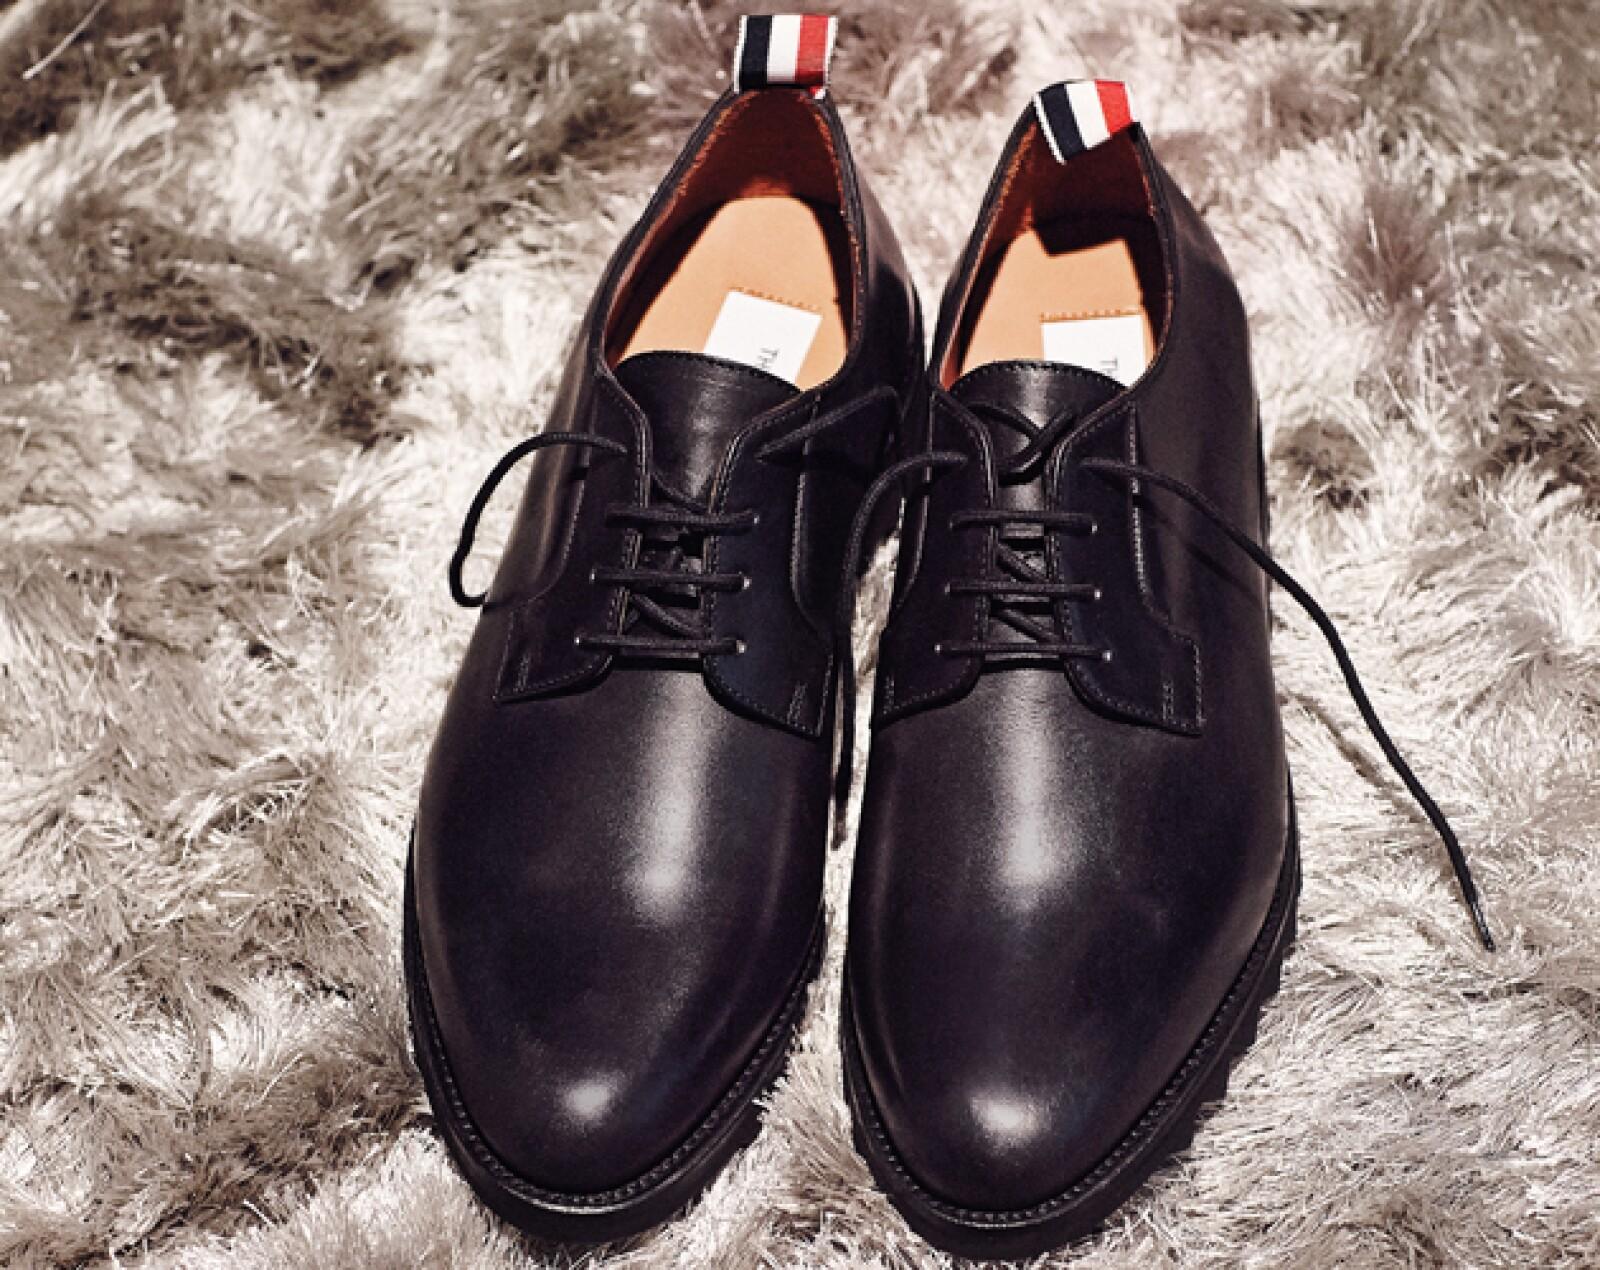 Zapatos, Ermenegildo Zegna. Pantalones, Incotex para Silver Deer. Calcetines, Opus para Sears.